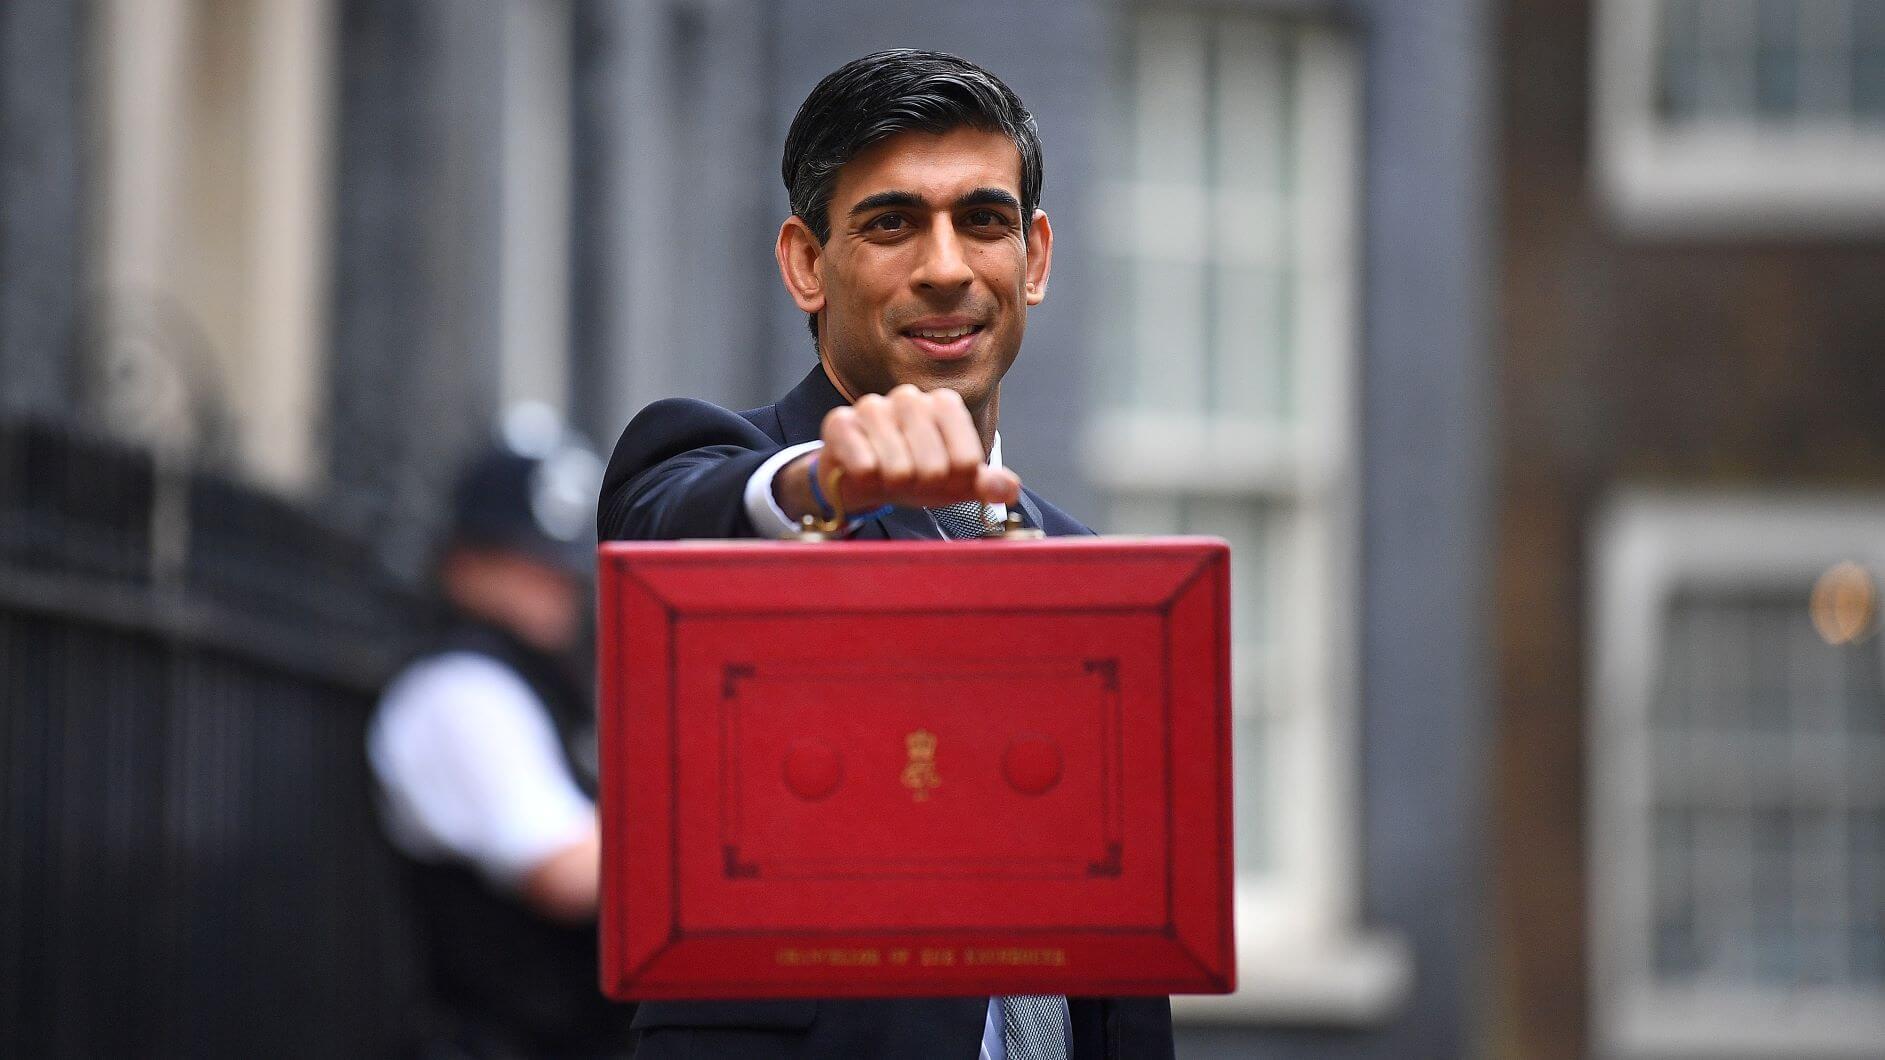 Budget Live: Highlights Of The Chancellor's Speech